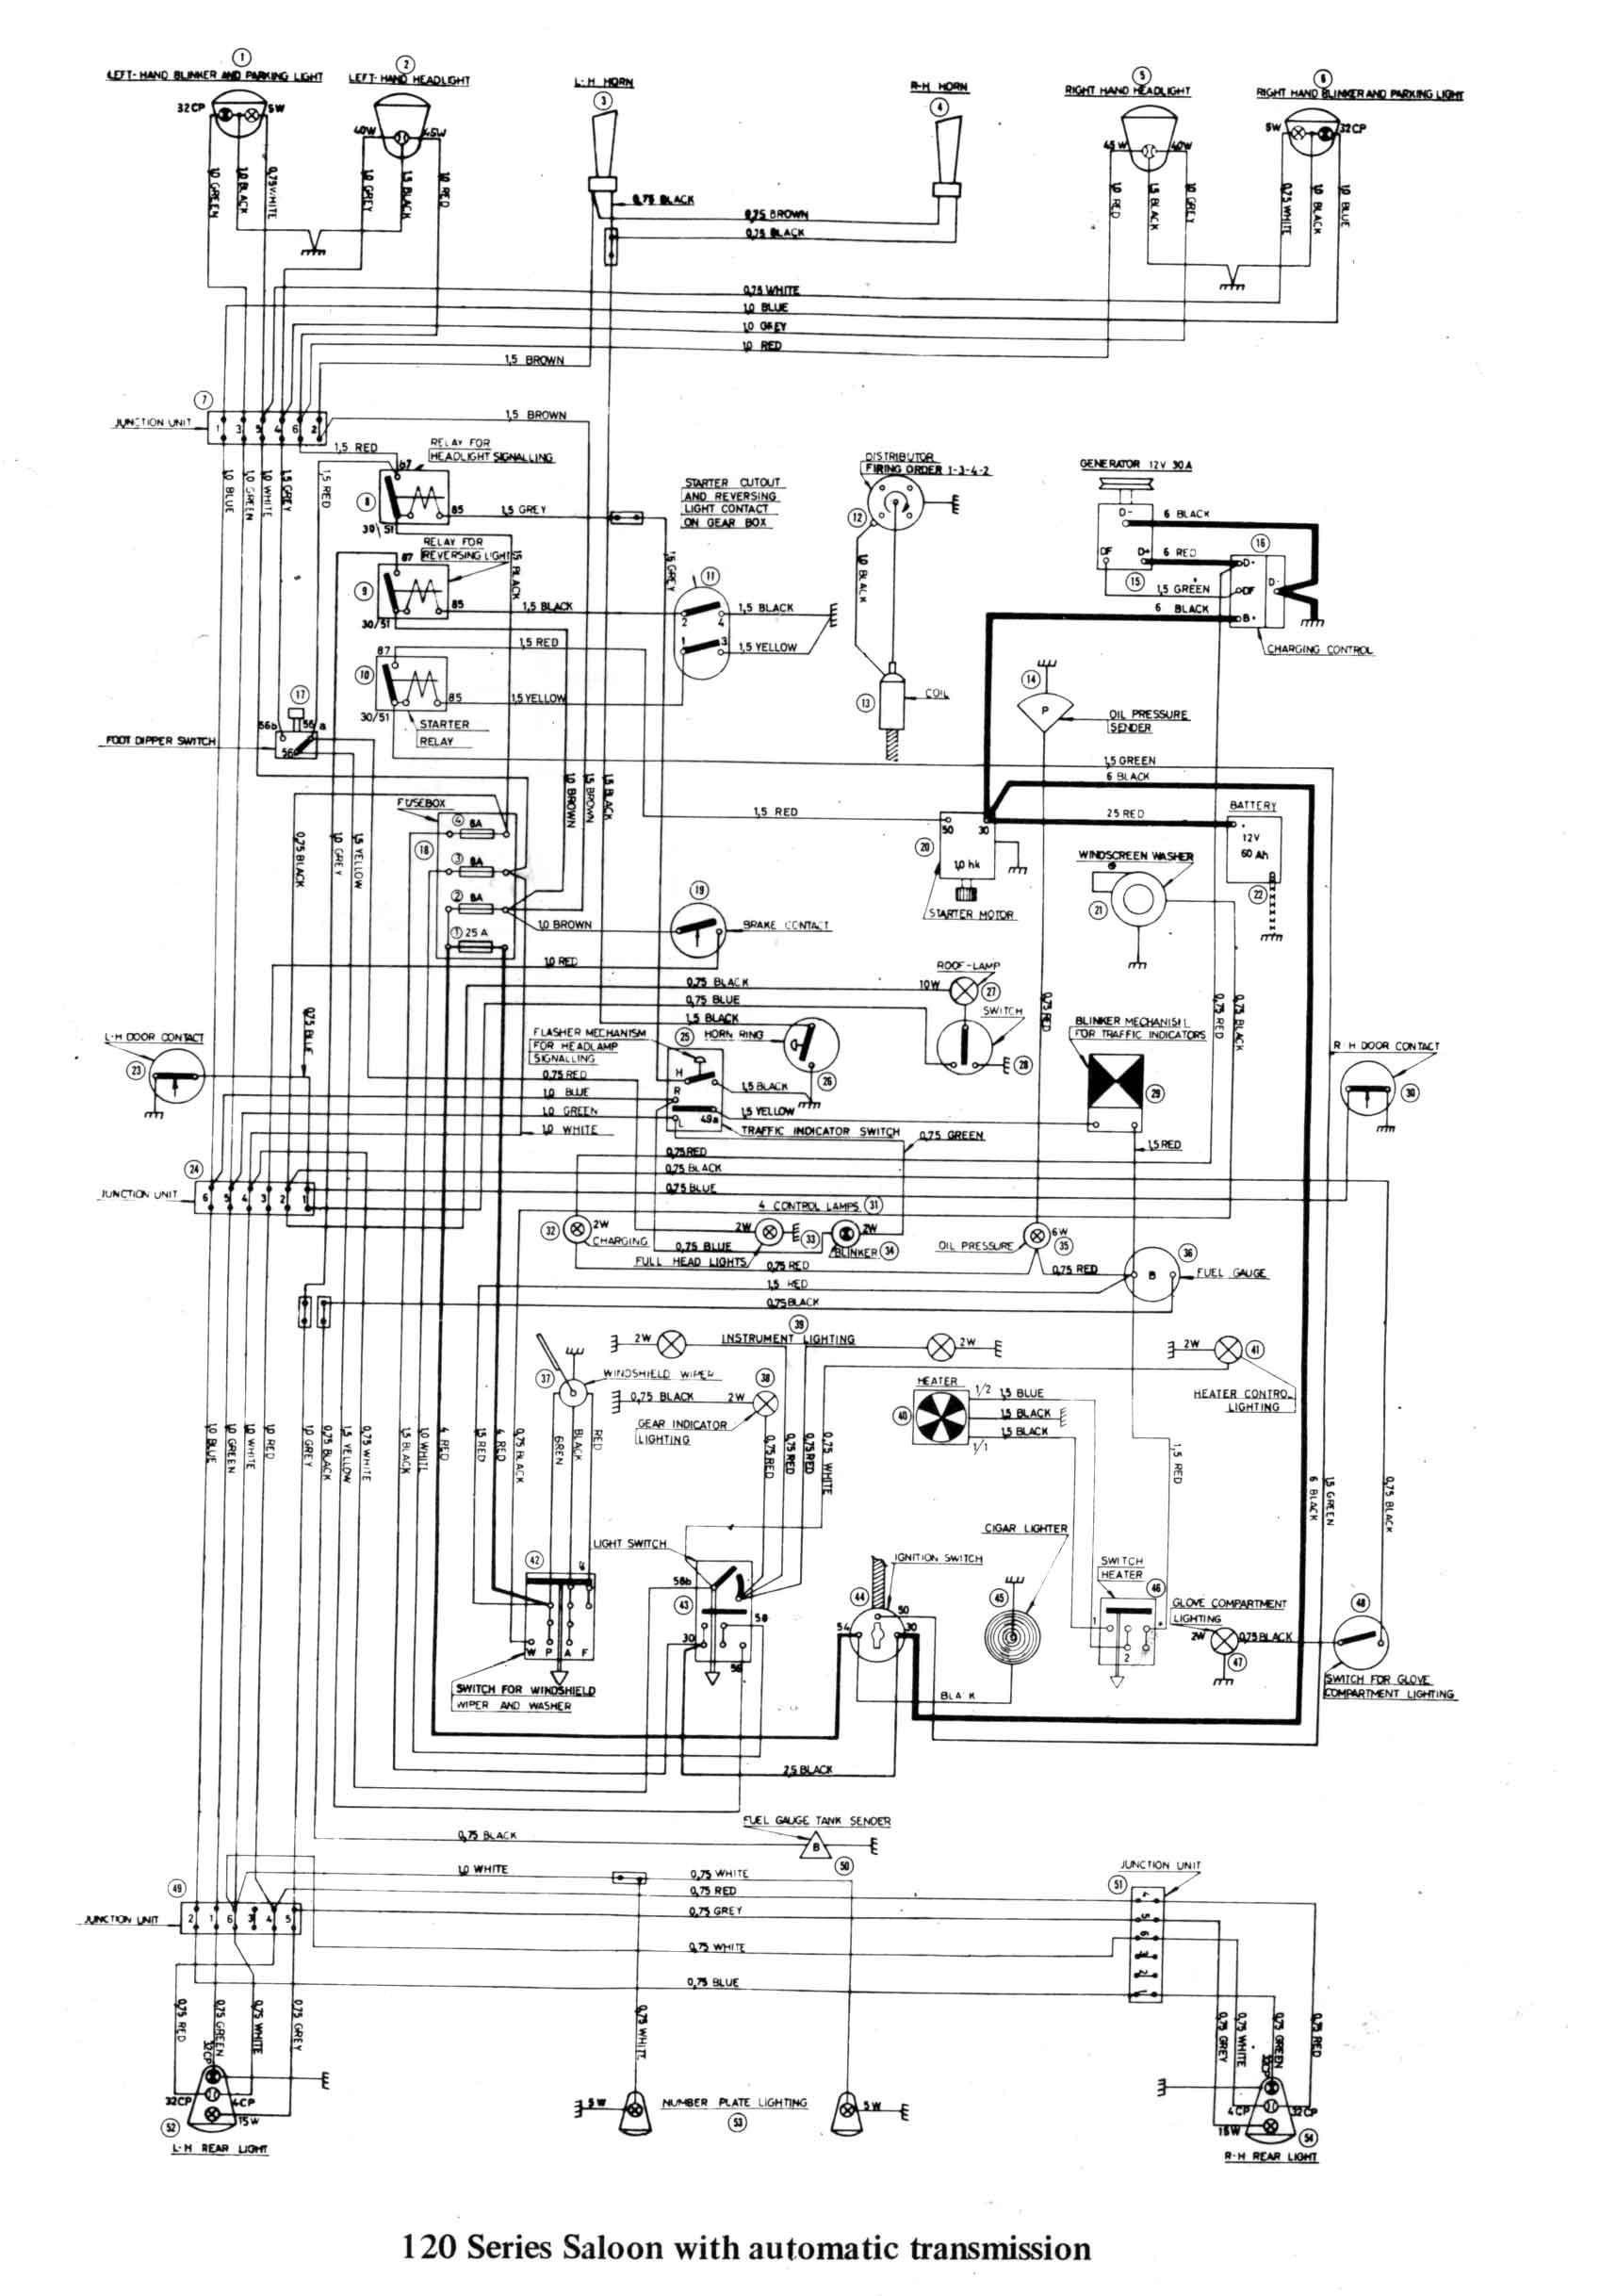 Classic Car Wiring Diagrams Unique Starter Wiring Diagram Diagram Of Classic Car Wiring Diagrams